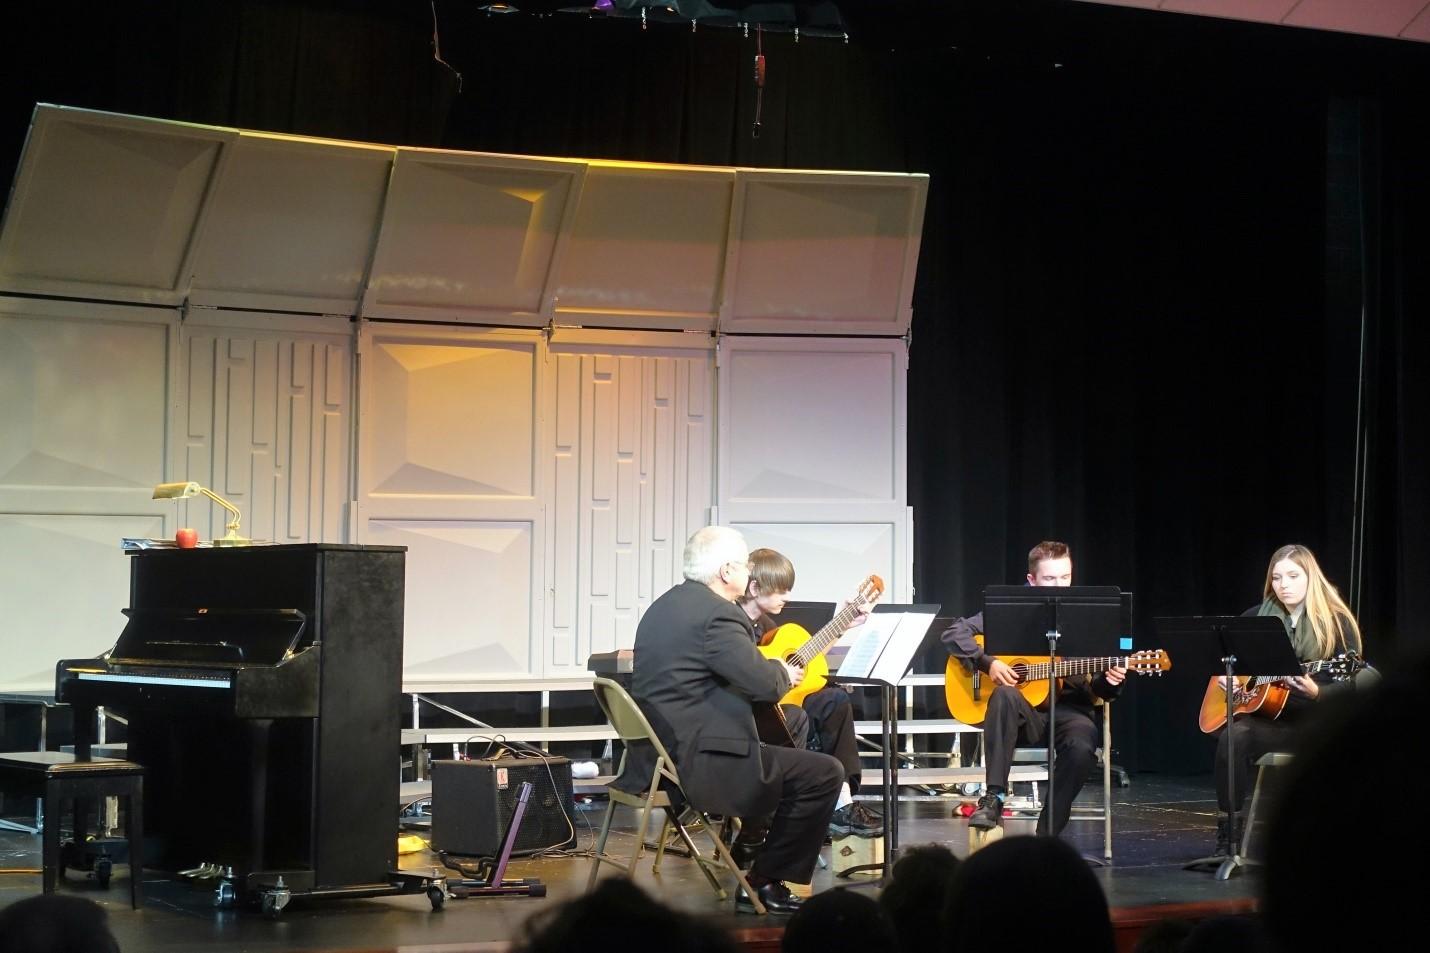 Latin salsa, European folksong, and Japanese kyoto--the Guitar Ensemble has it all. Photo Credit: Regina Zabinski